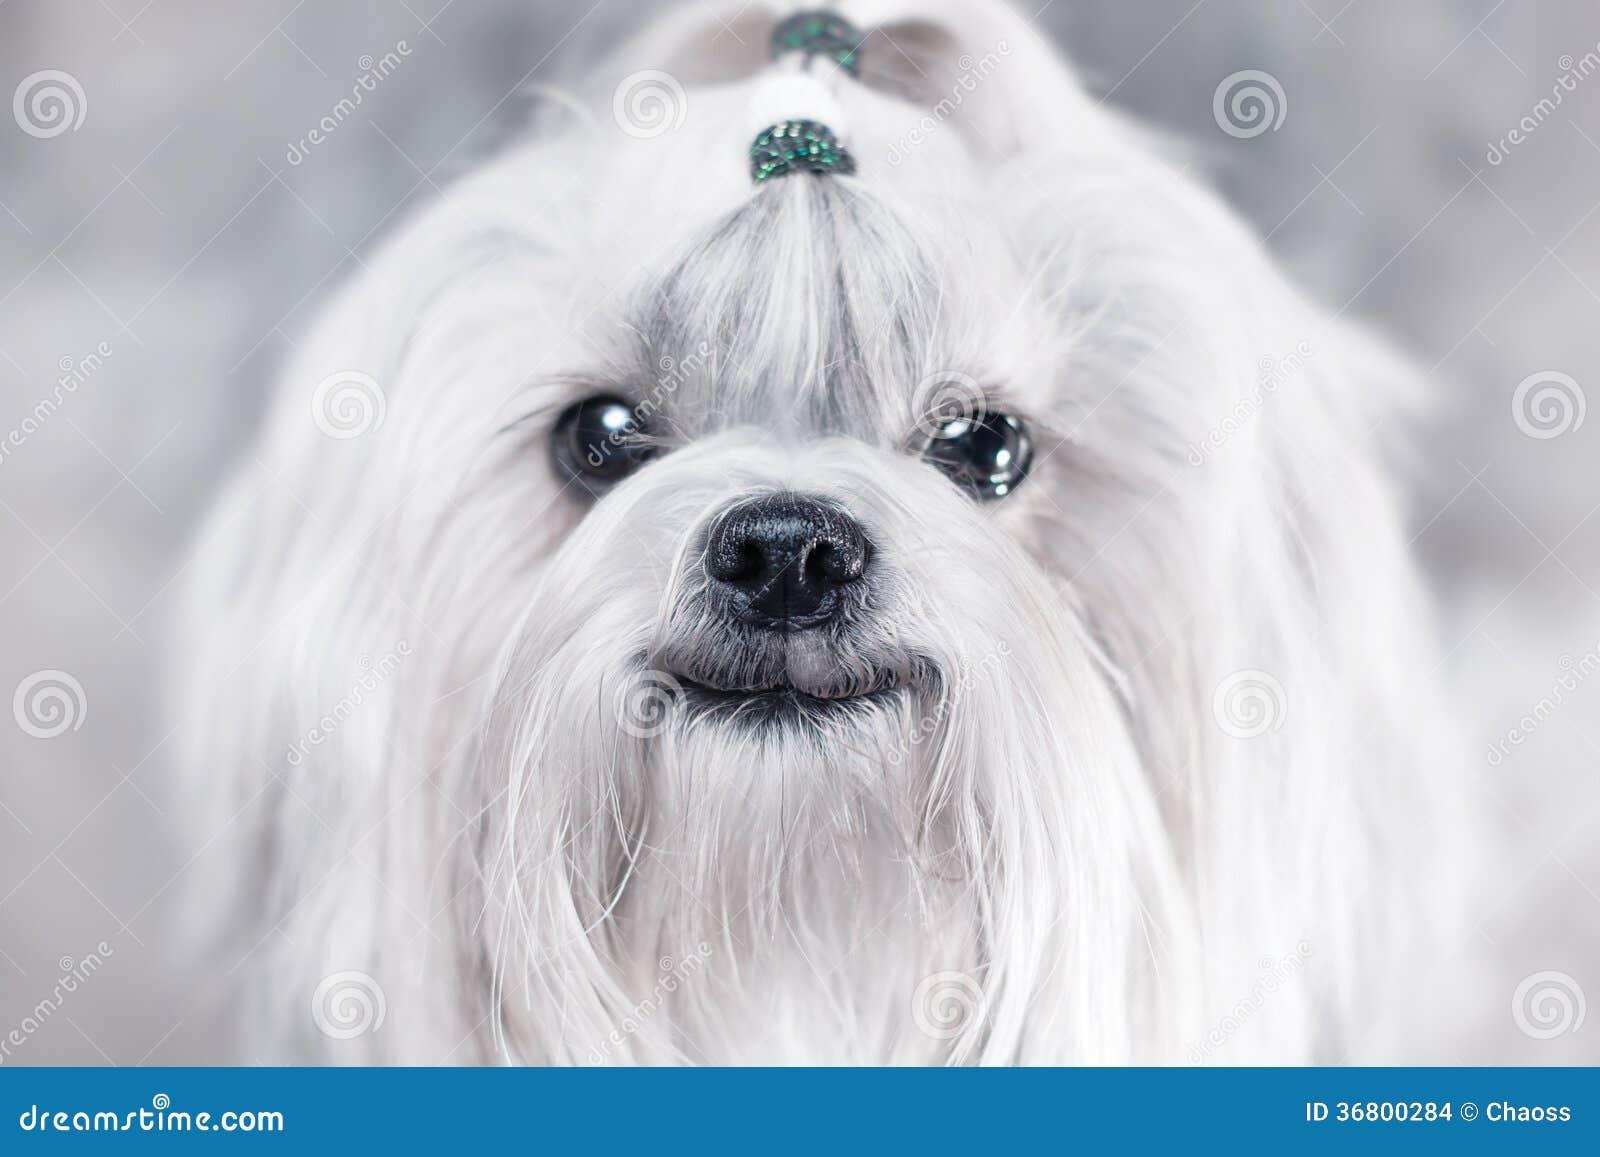 Shih tzu dog smiling